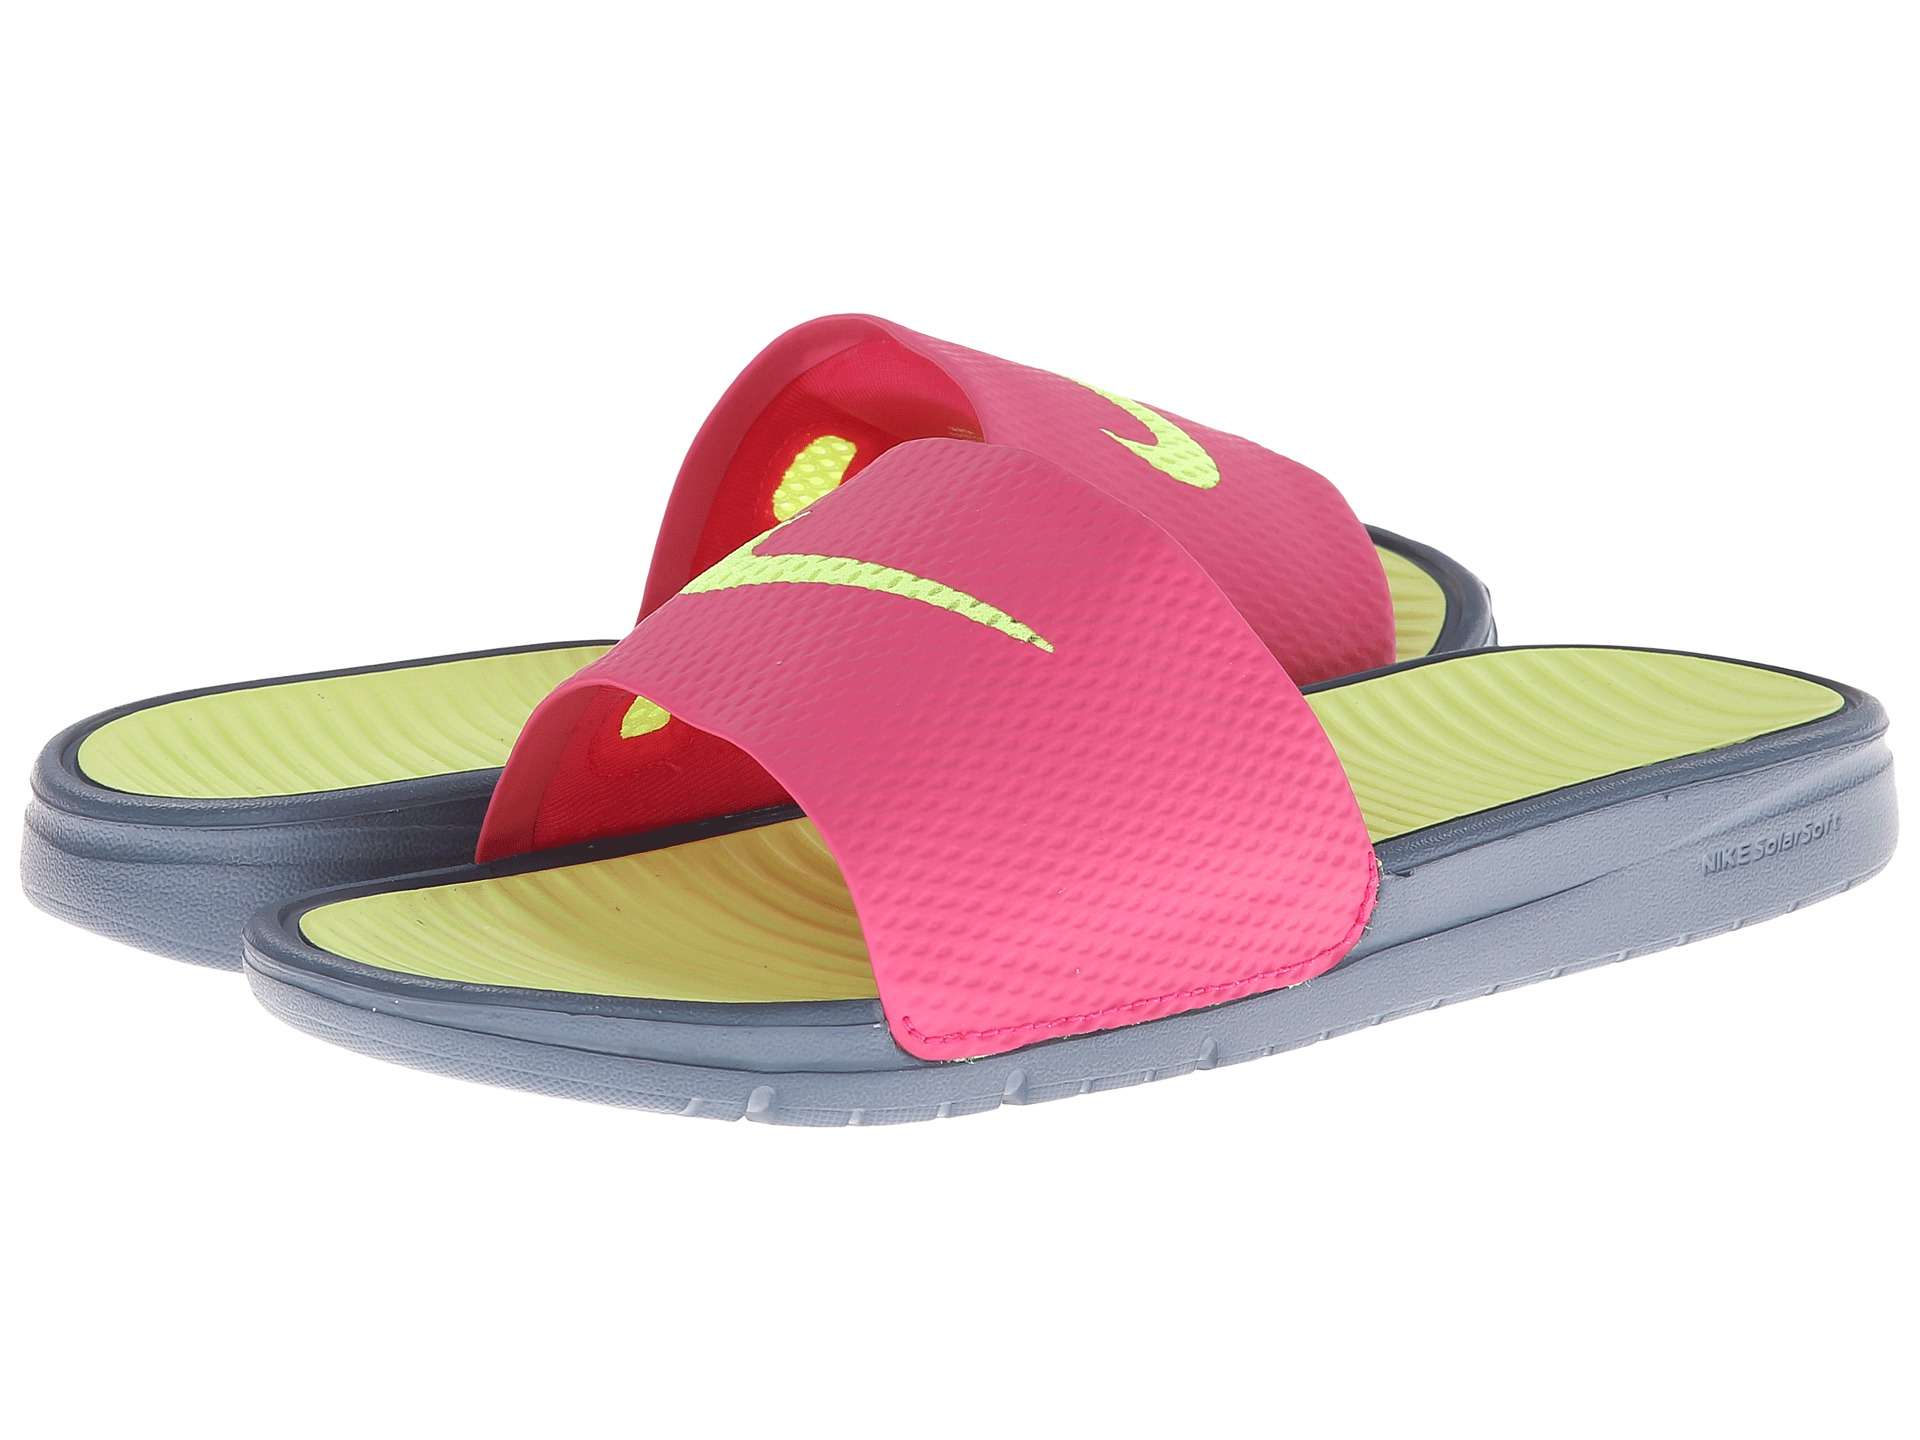 cf09306bd81e ... solarsoft slide 2 sandal black white c9a20 d67c7  ebay gallery.  previously sold at zappos womens nike benassi 1c064 cc2b8